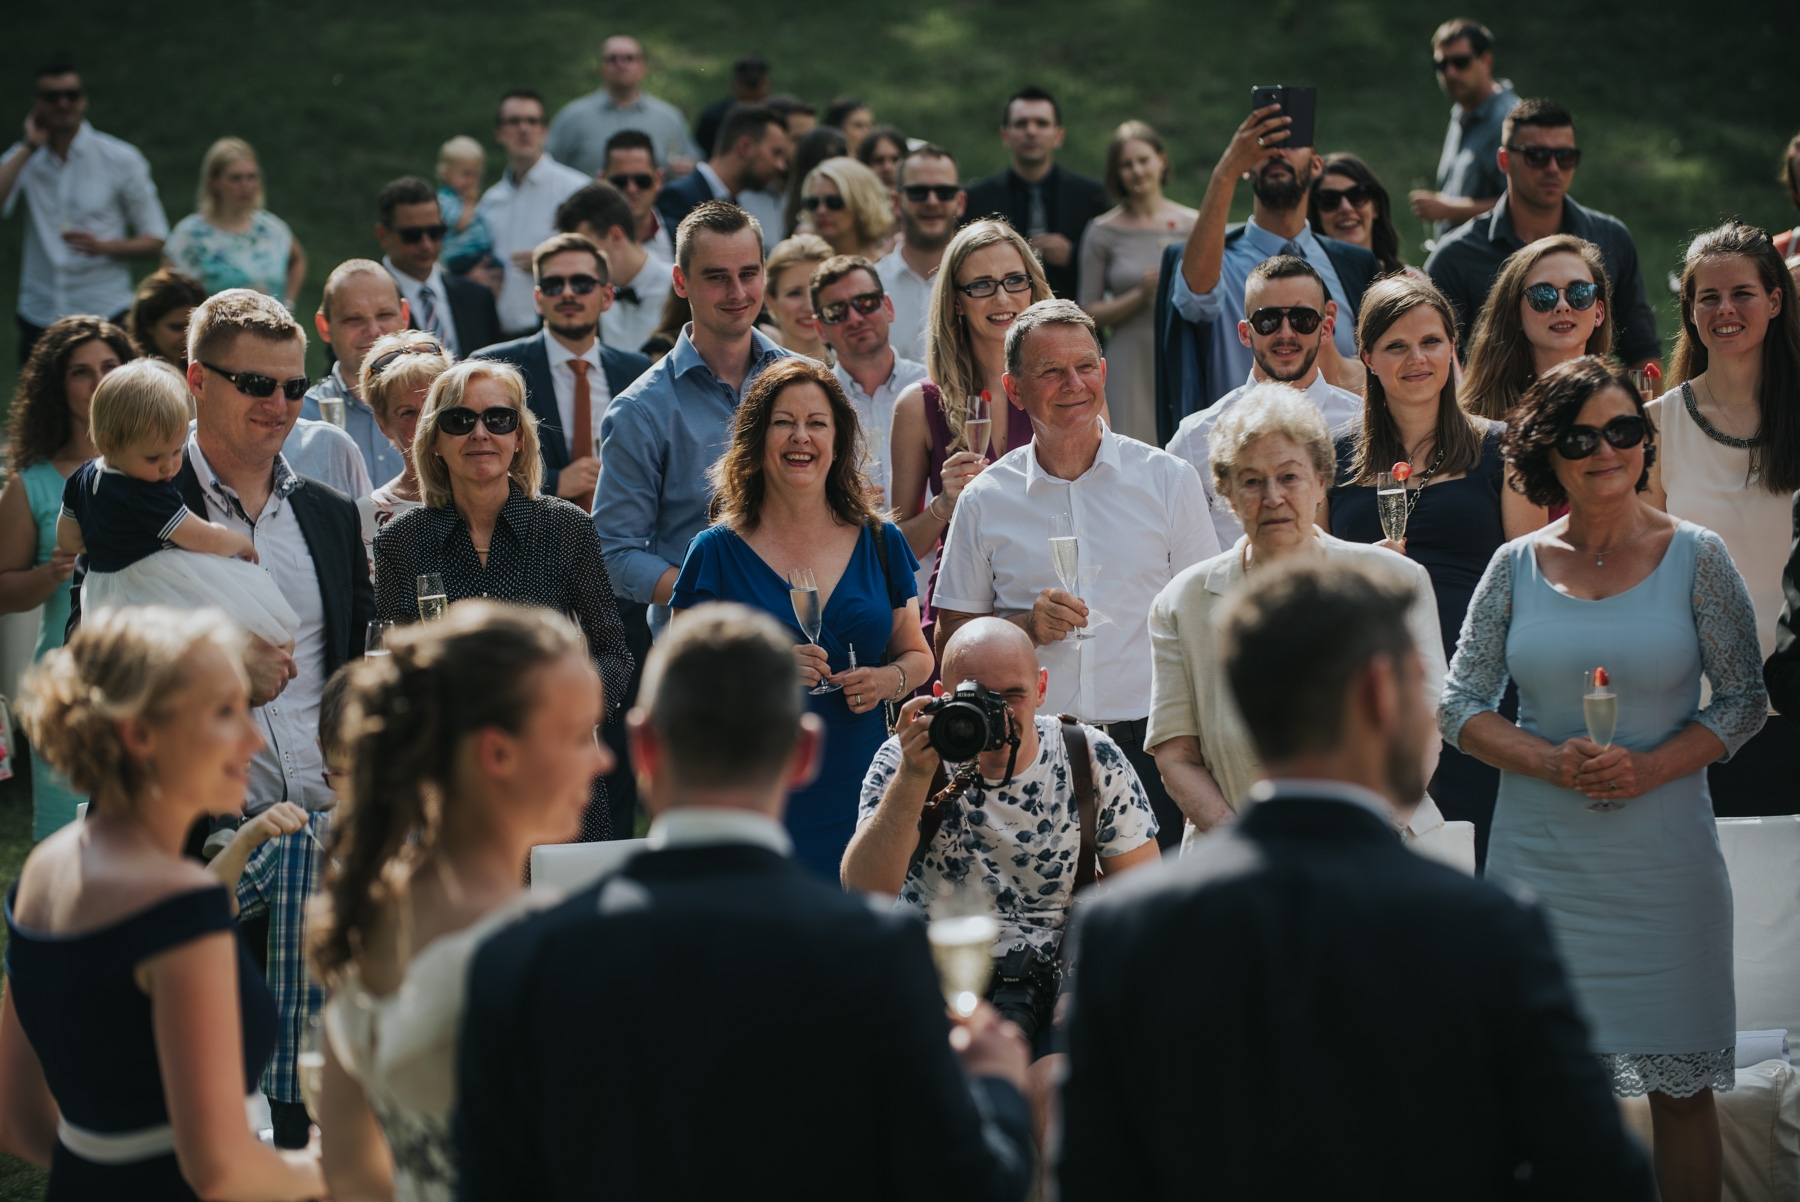 Ślub Goran VK - Słowenia Velenje - Vadlja Kamenjašević